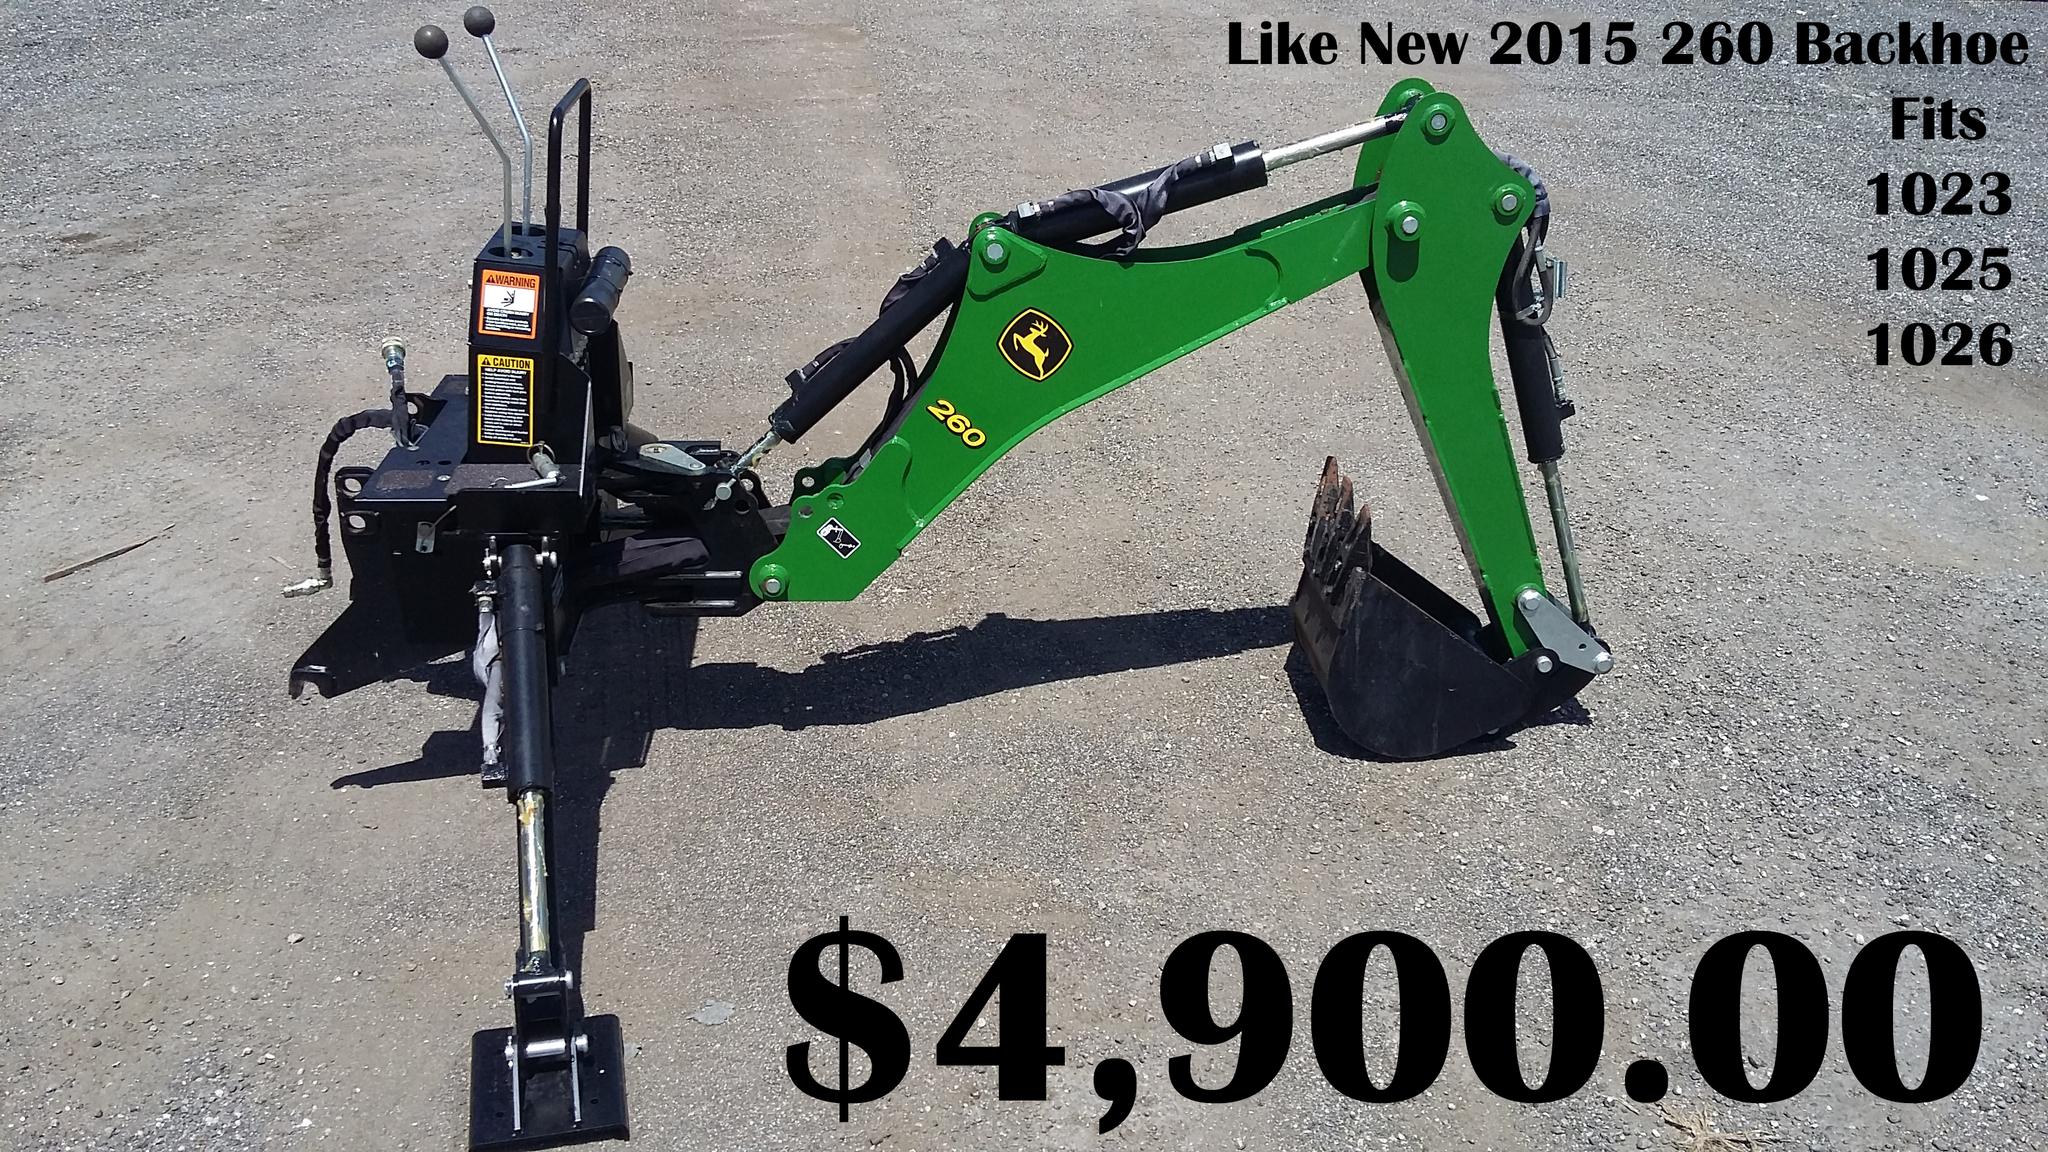 2015 John Deere 260 - Miscellaneous Tractor Attachments - John Deere  MachineFinder